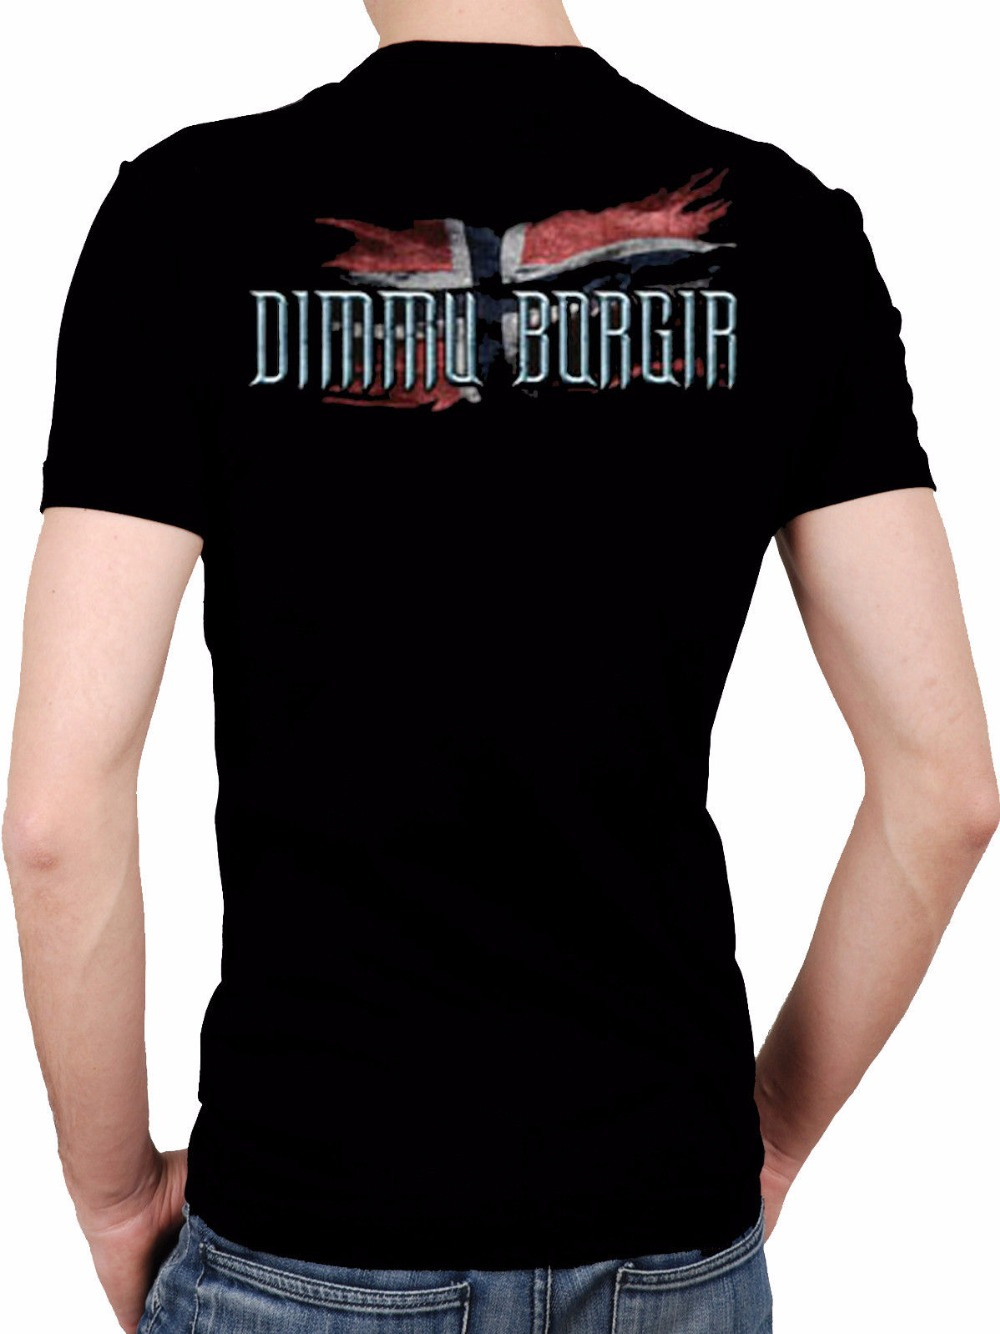 Cheap Tee Shirts Short Dimmu Borgir Band Black T-Shirt Rock T-Shirt Rock Band Shirt Rock Tee Men Printed O-Neck Tee